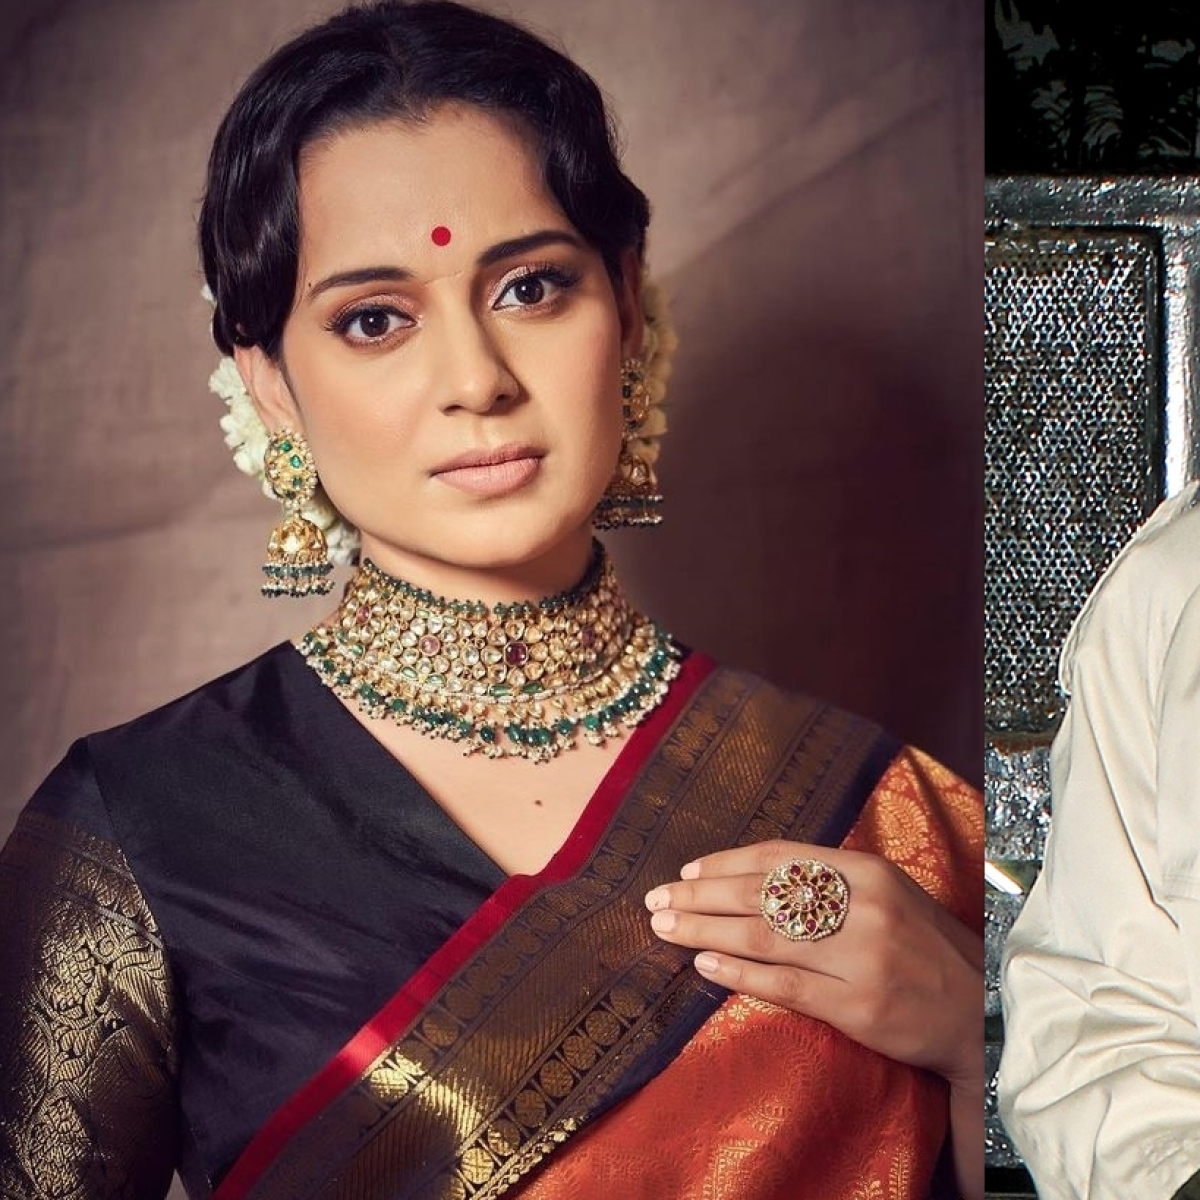 Kangana Ranaut claims Akshay Kumar secretly praised the trailer of her upcoming film 'Thalaivi'